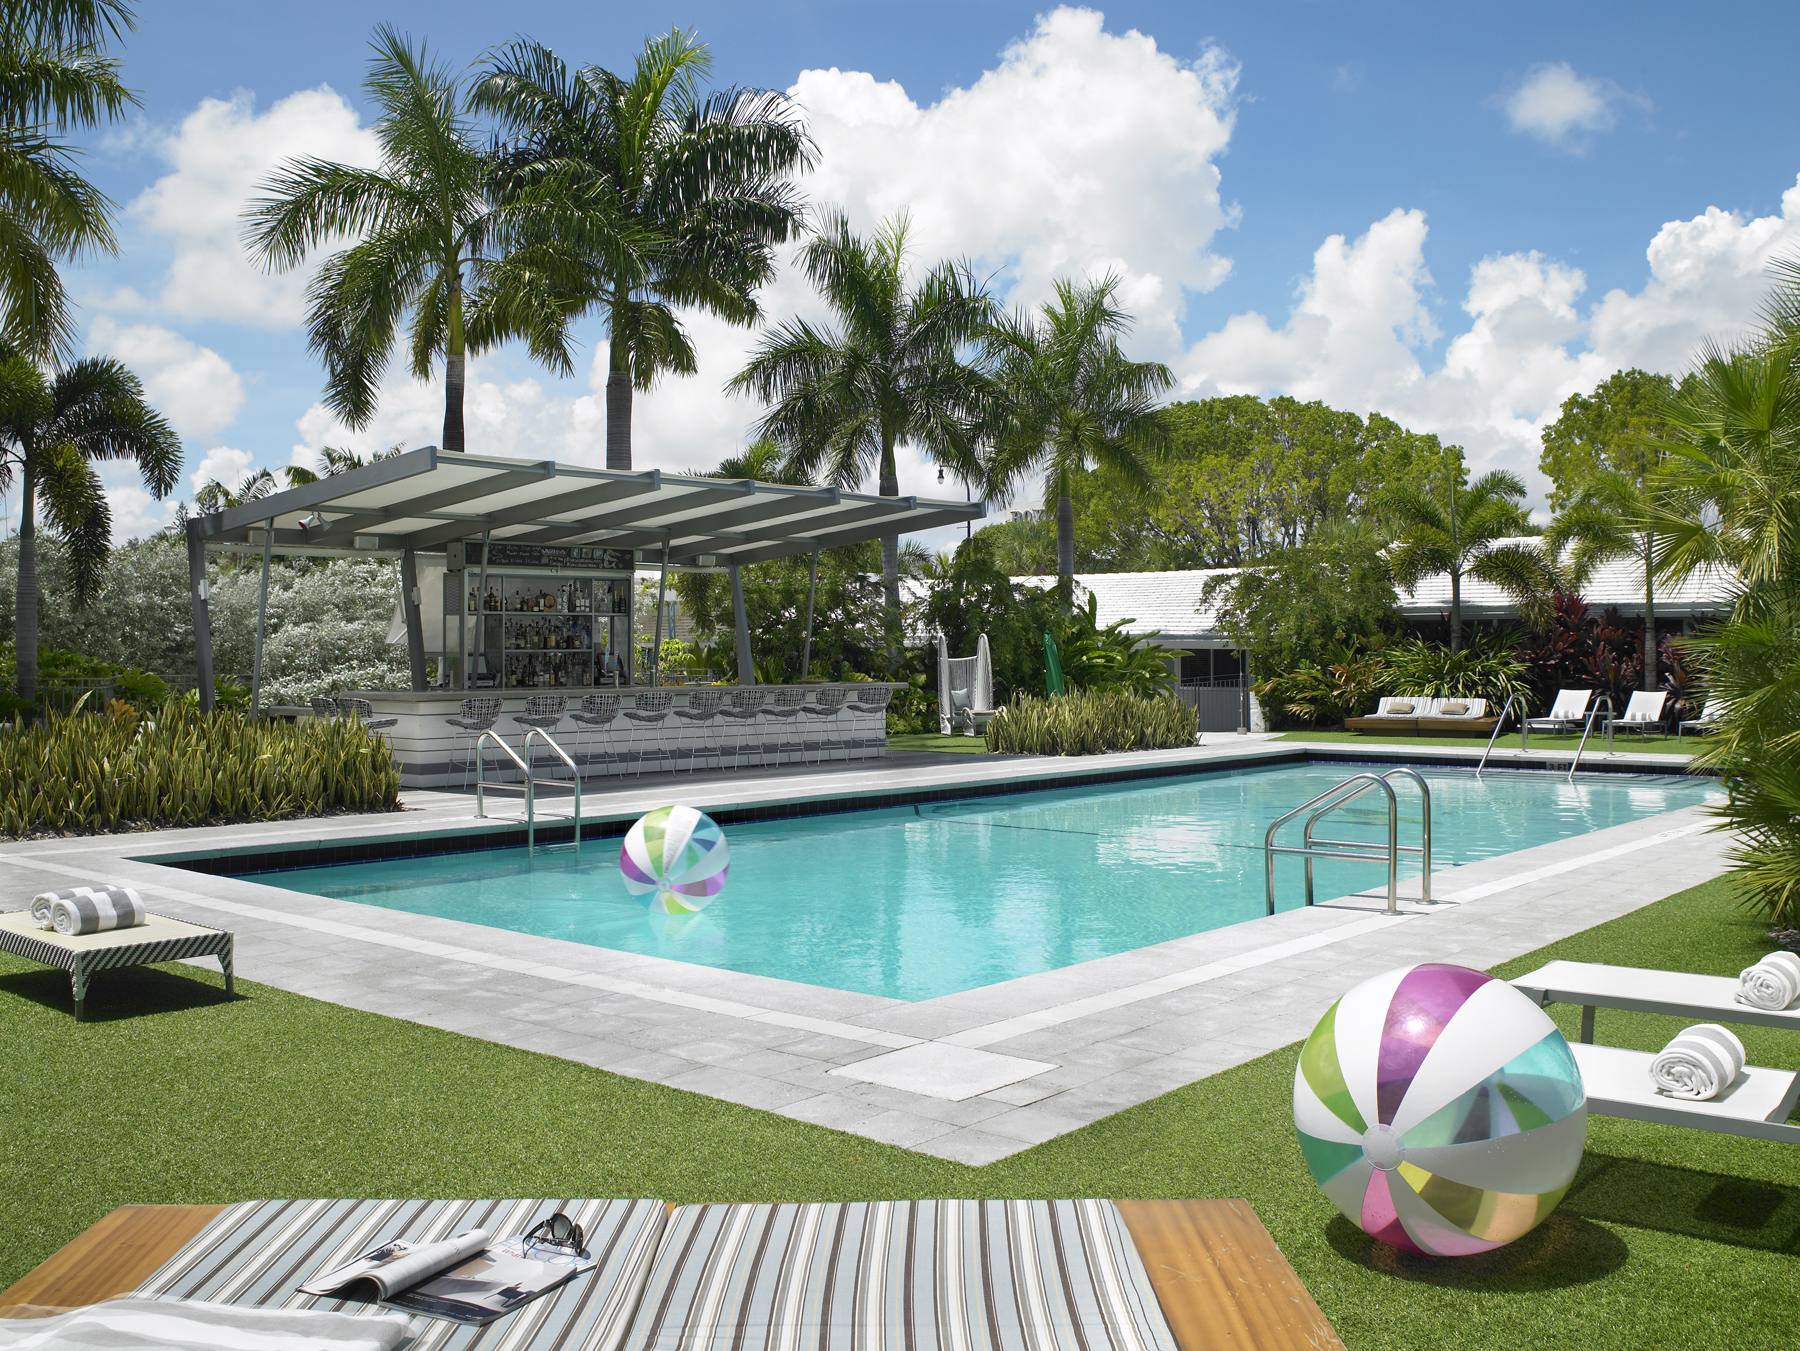 pool daytime 1.jpg